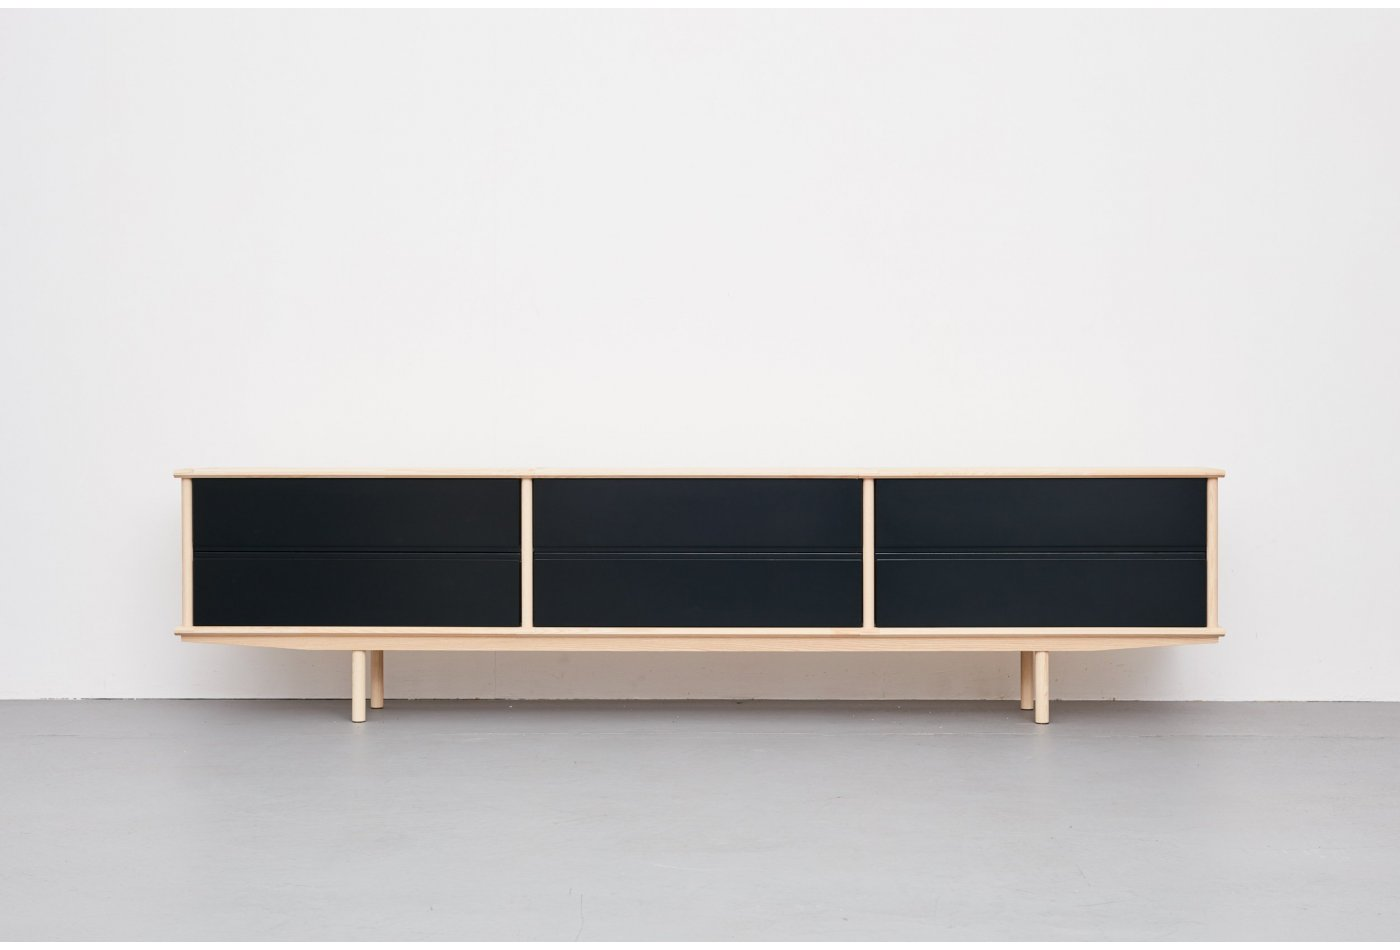 SPLITTER 3 x 1 - incl. drawers